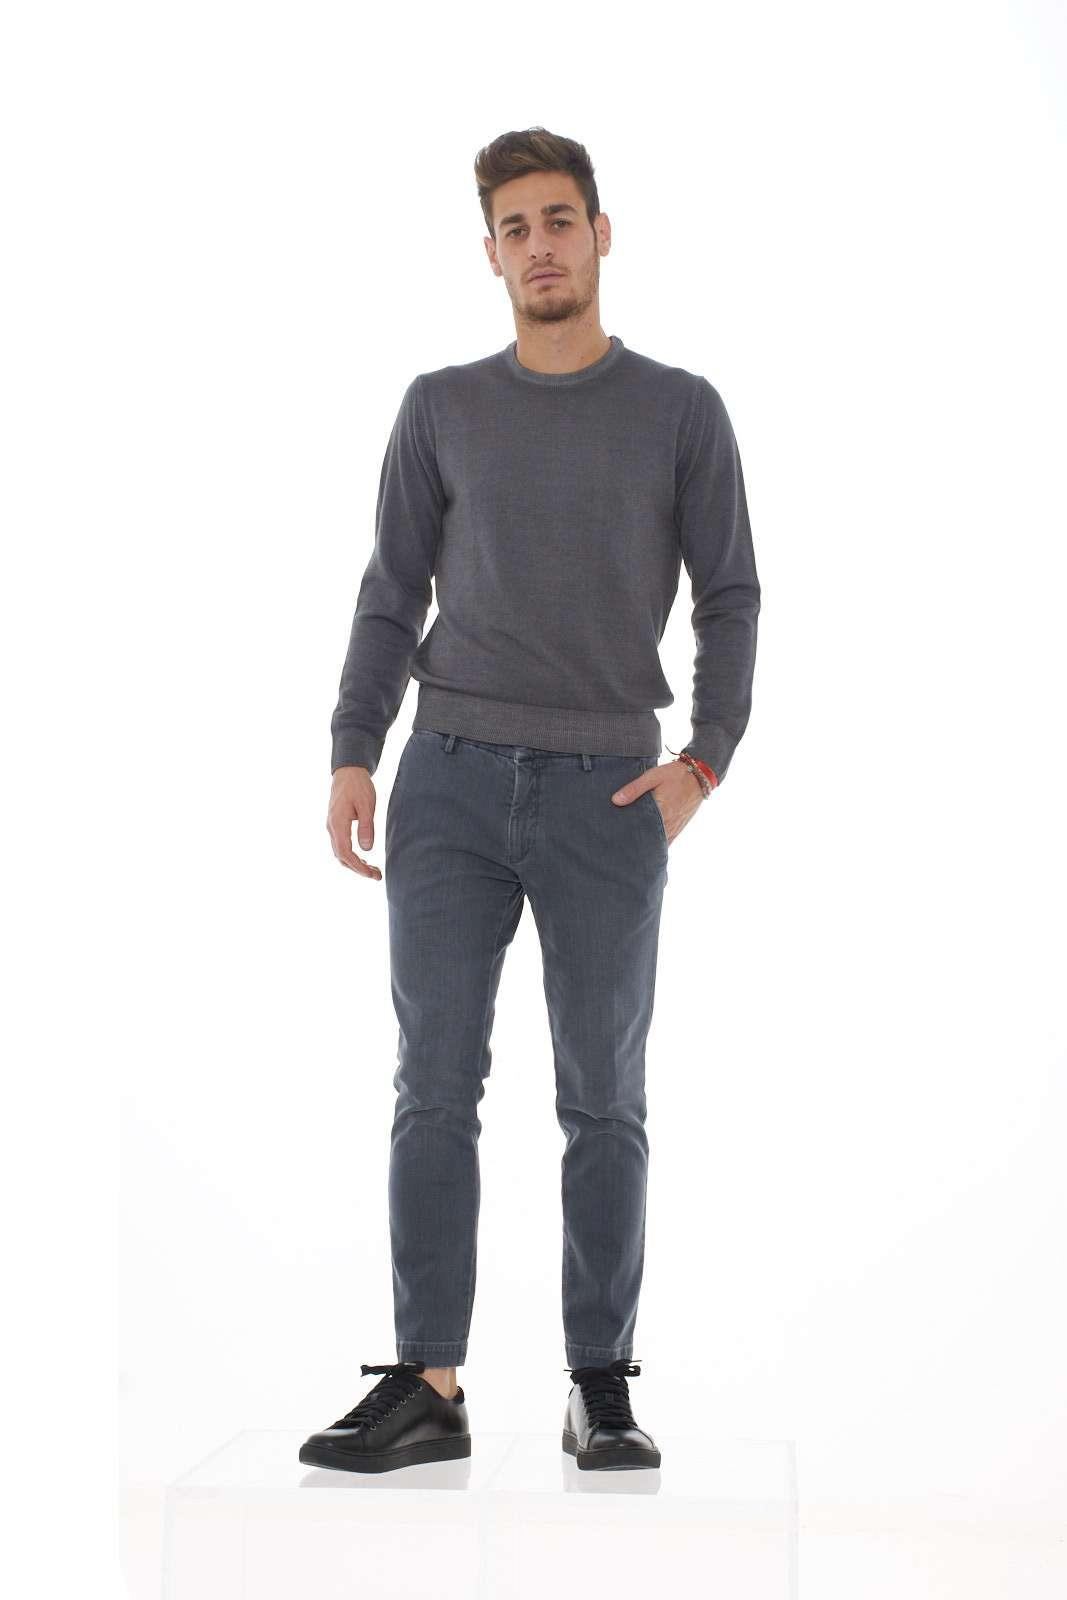 https://www.parmax.com/media/catalog/product/A/I/AI-outlet_parmax-pantalone-uomo-Michael-Coal-Brad1060-D.jpg